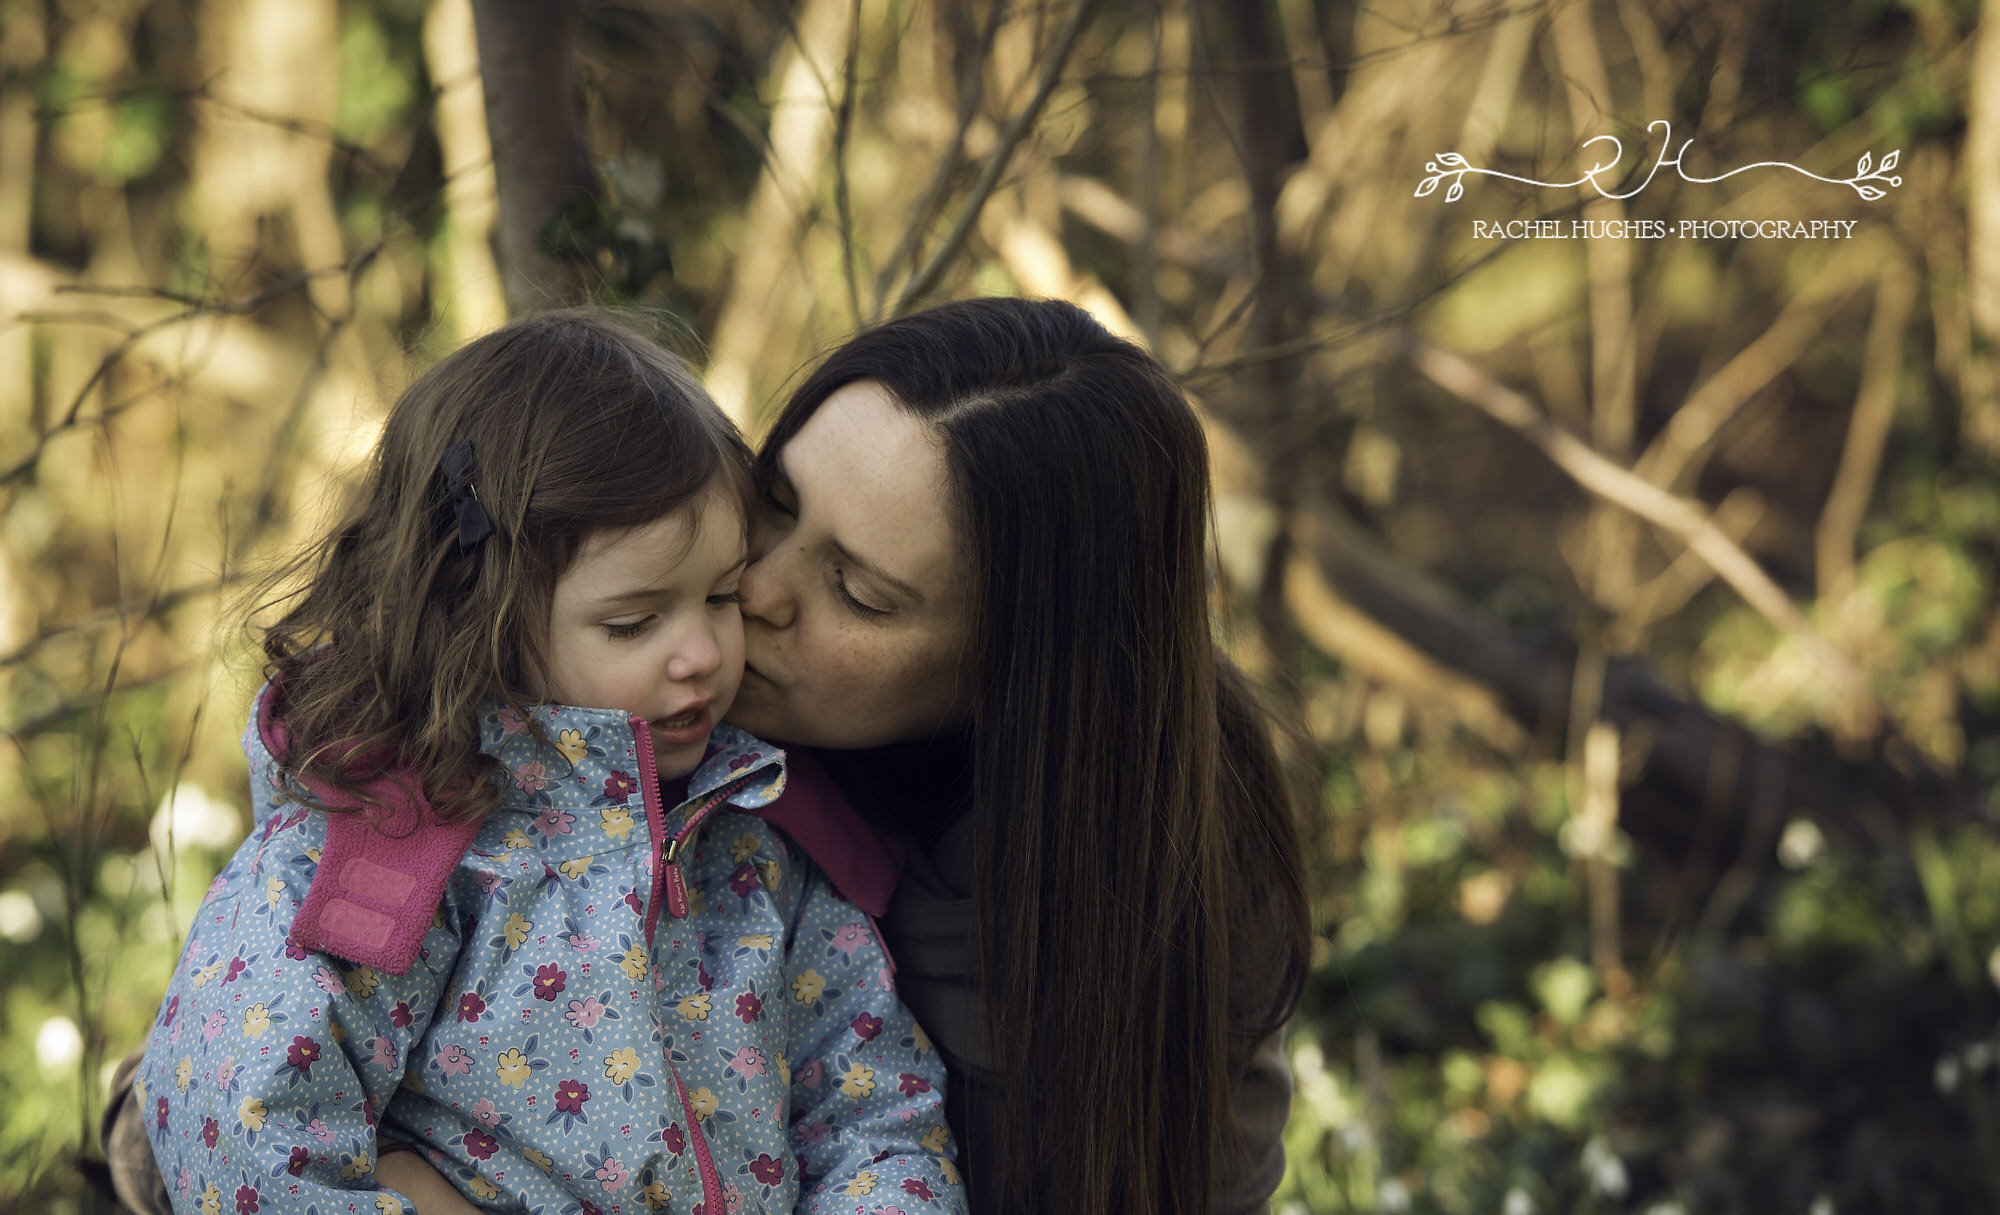 Mummy and Me photoshoot